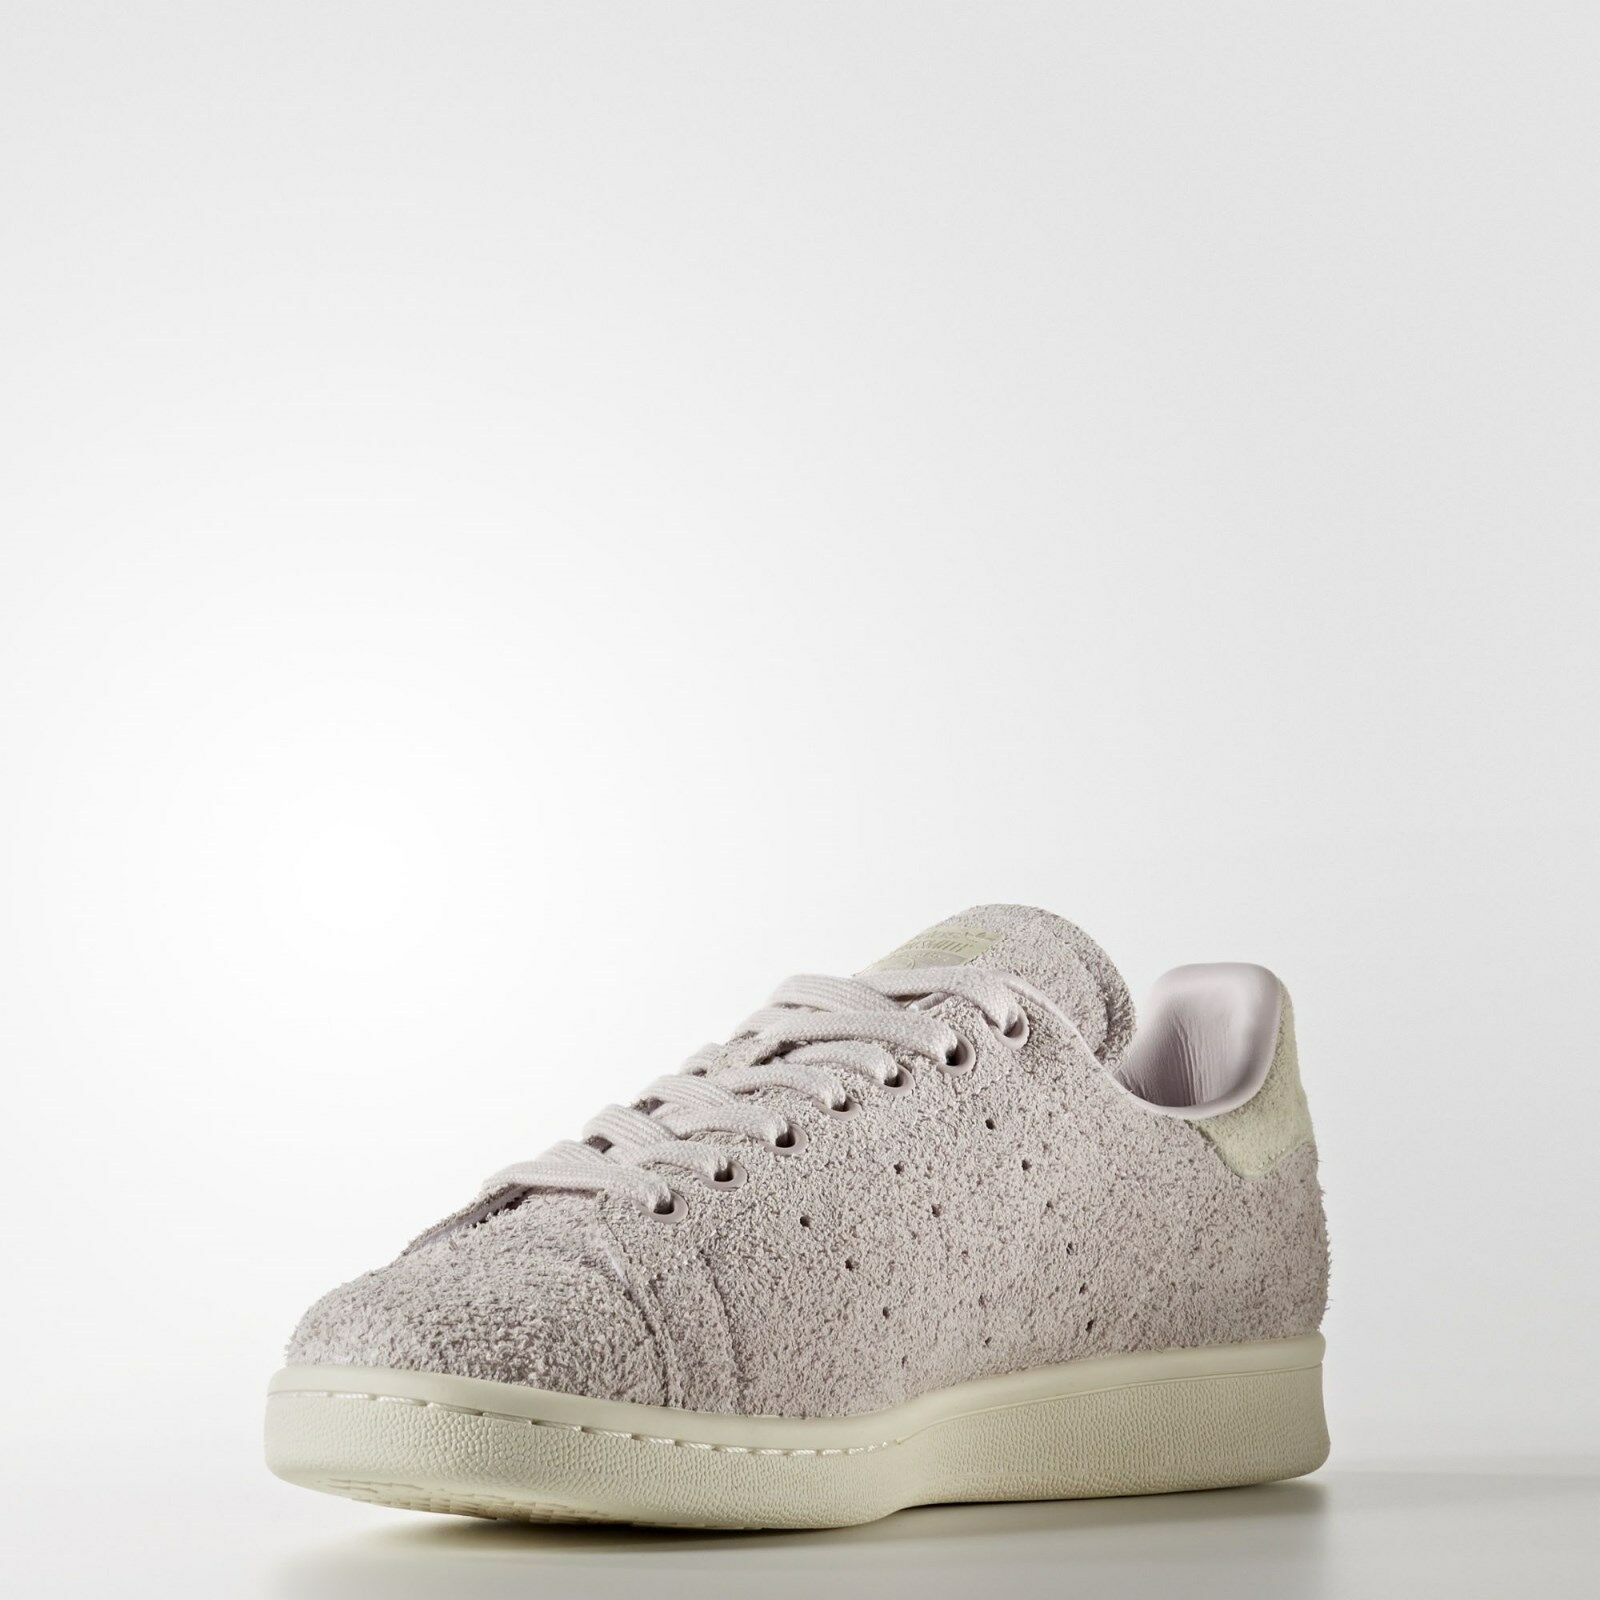 Adidas Originals Women's Stan Smith shoes Size 5 us us us S82258 daf091